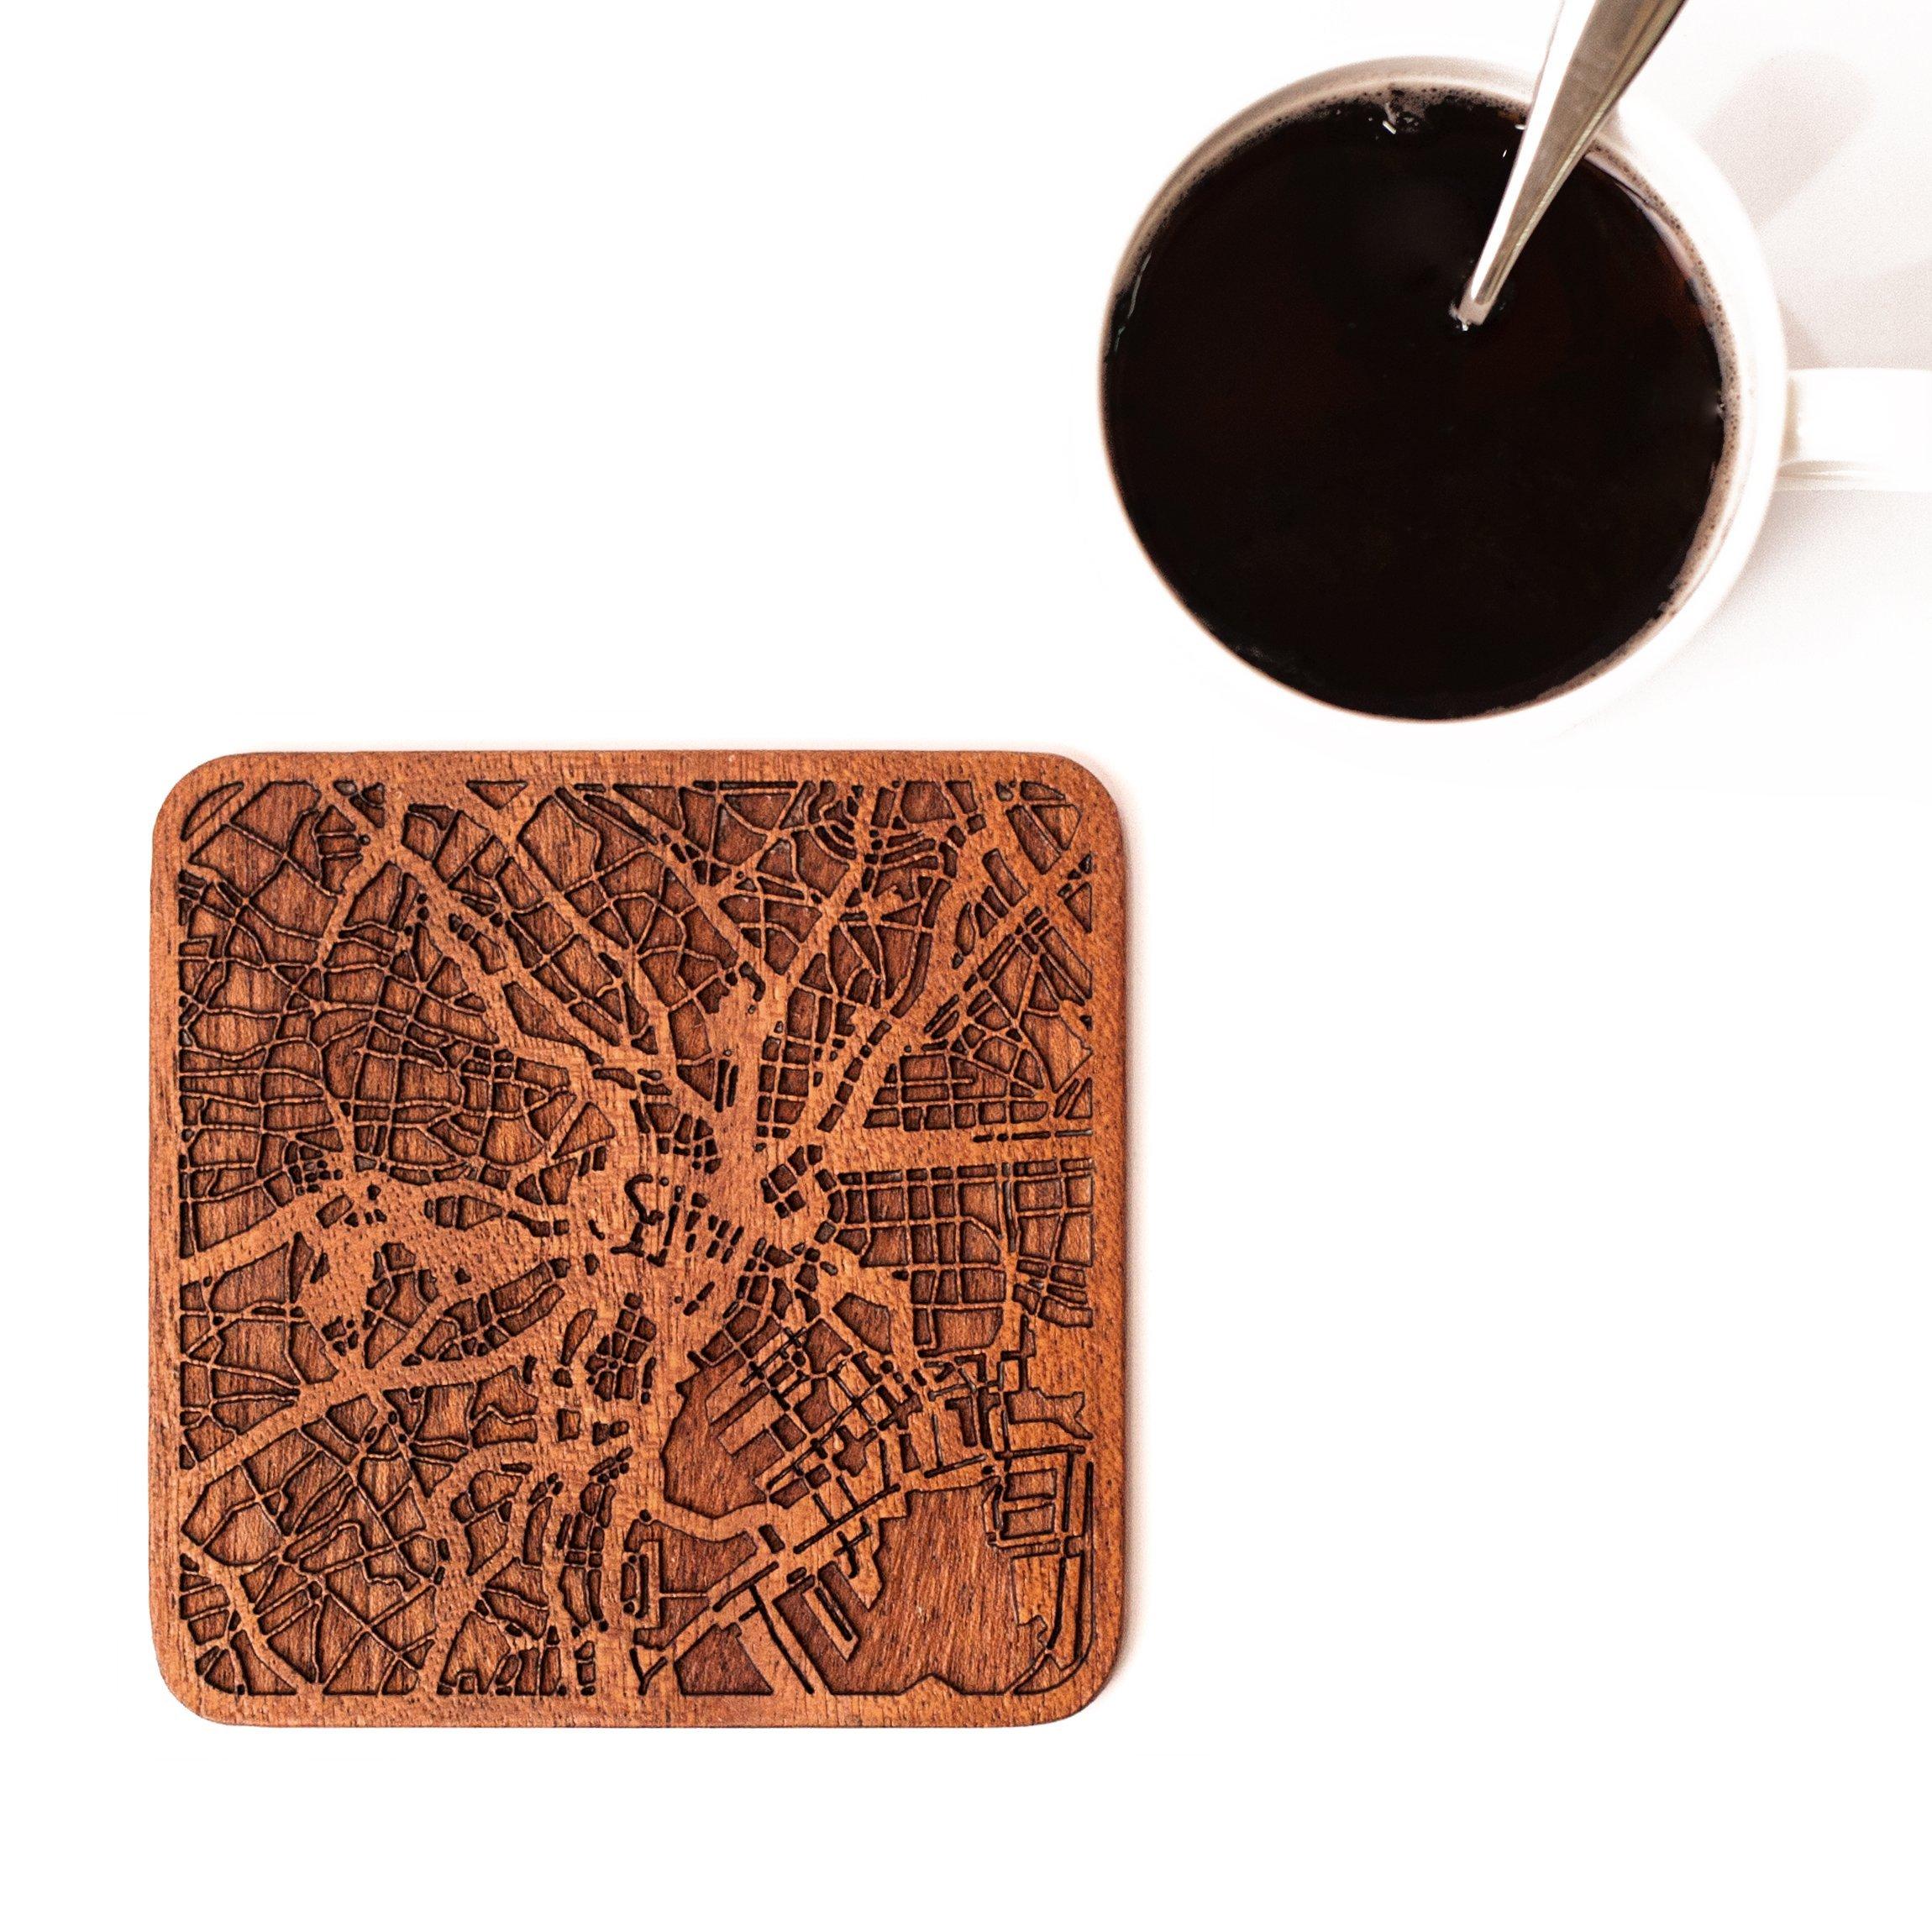 O3 Design Studio Tokyo Map Coasters, Set Of